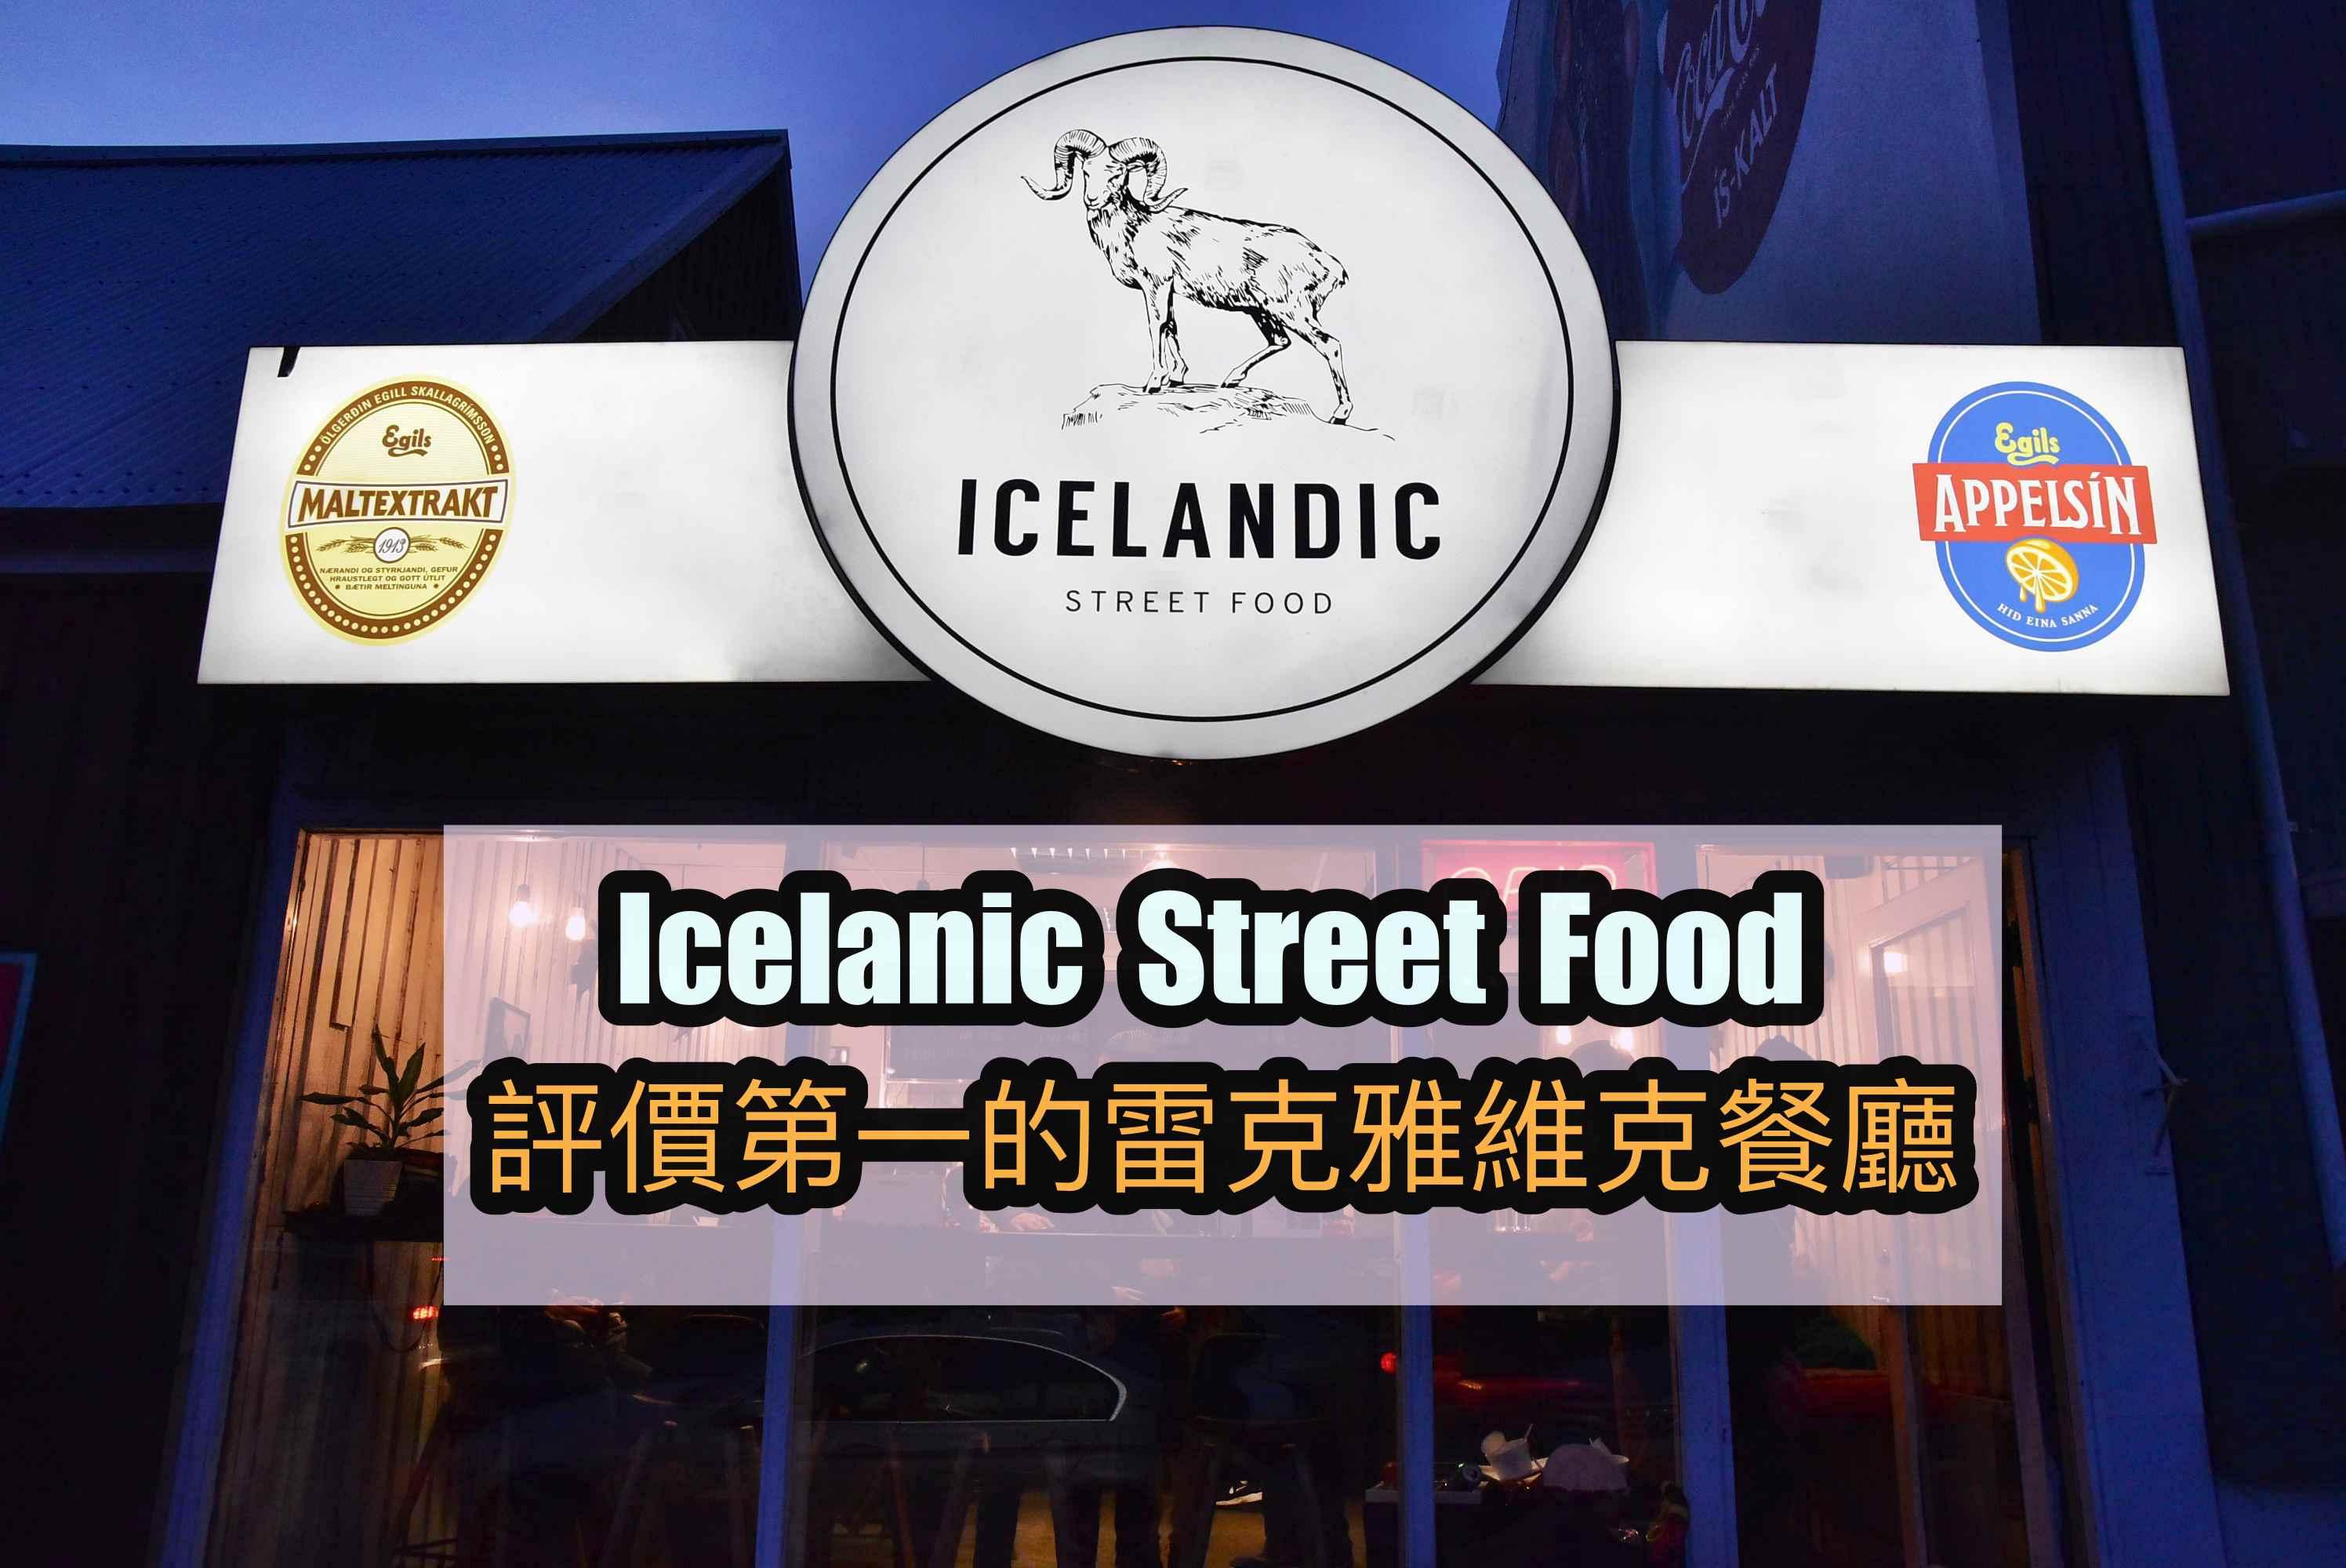 Icelanic Street Food,LAMB SOUP,雷克雅維克餐廳,雷克雅維克美食,雷克雅維克美食推薦 @Nash,神之領域